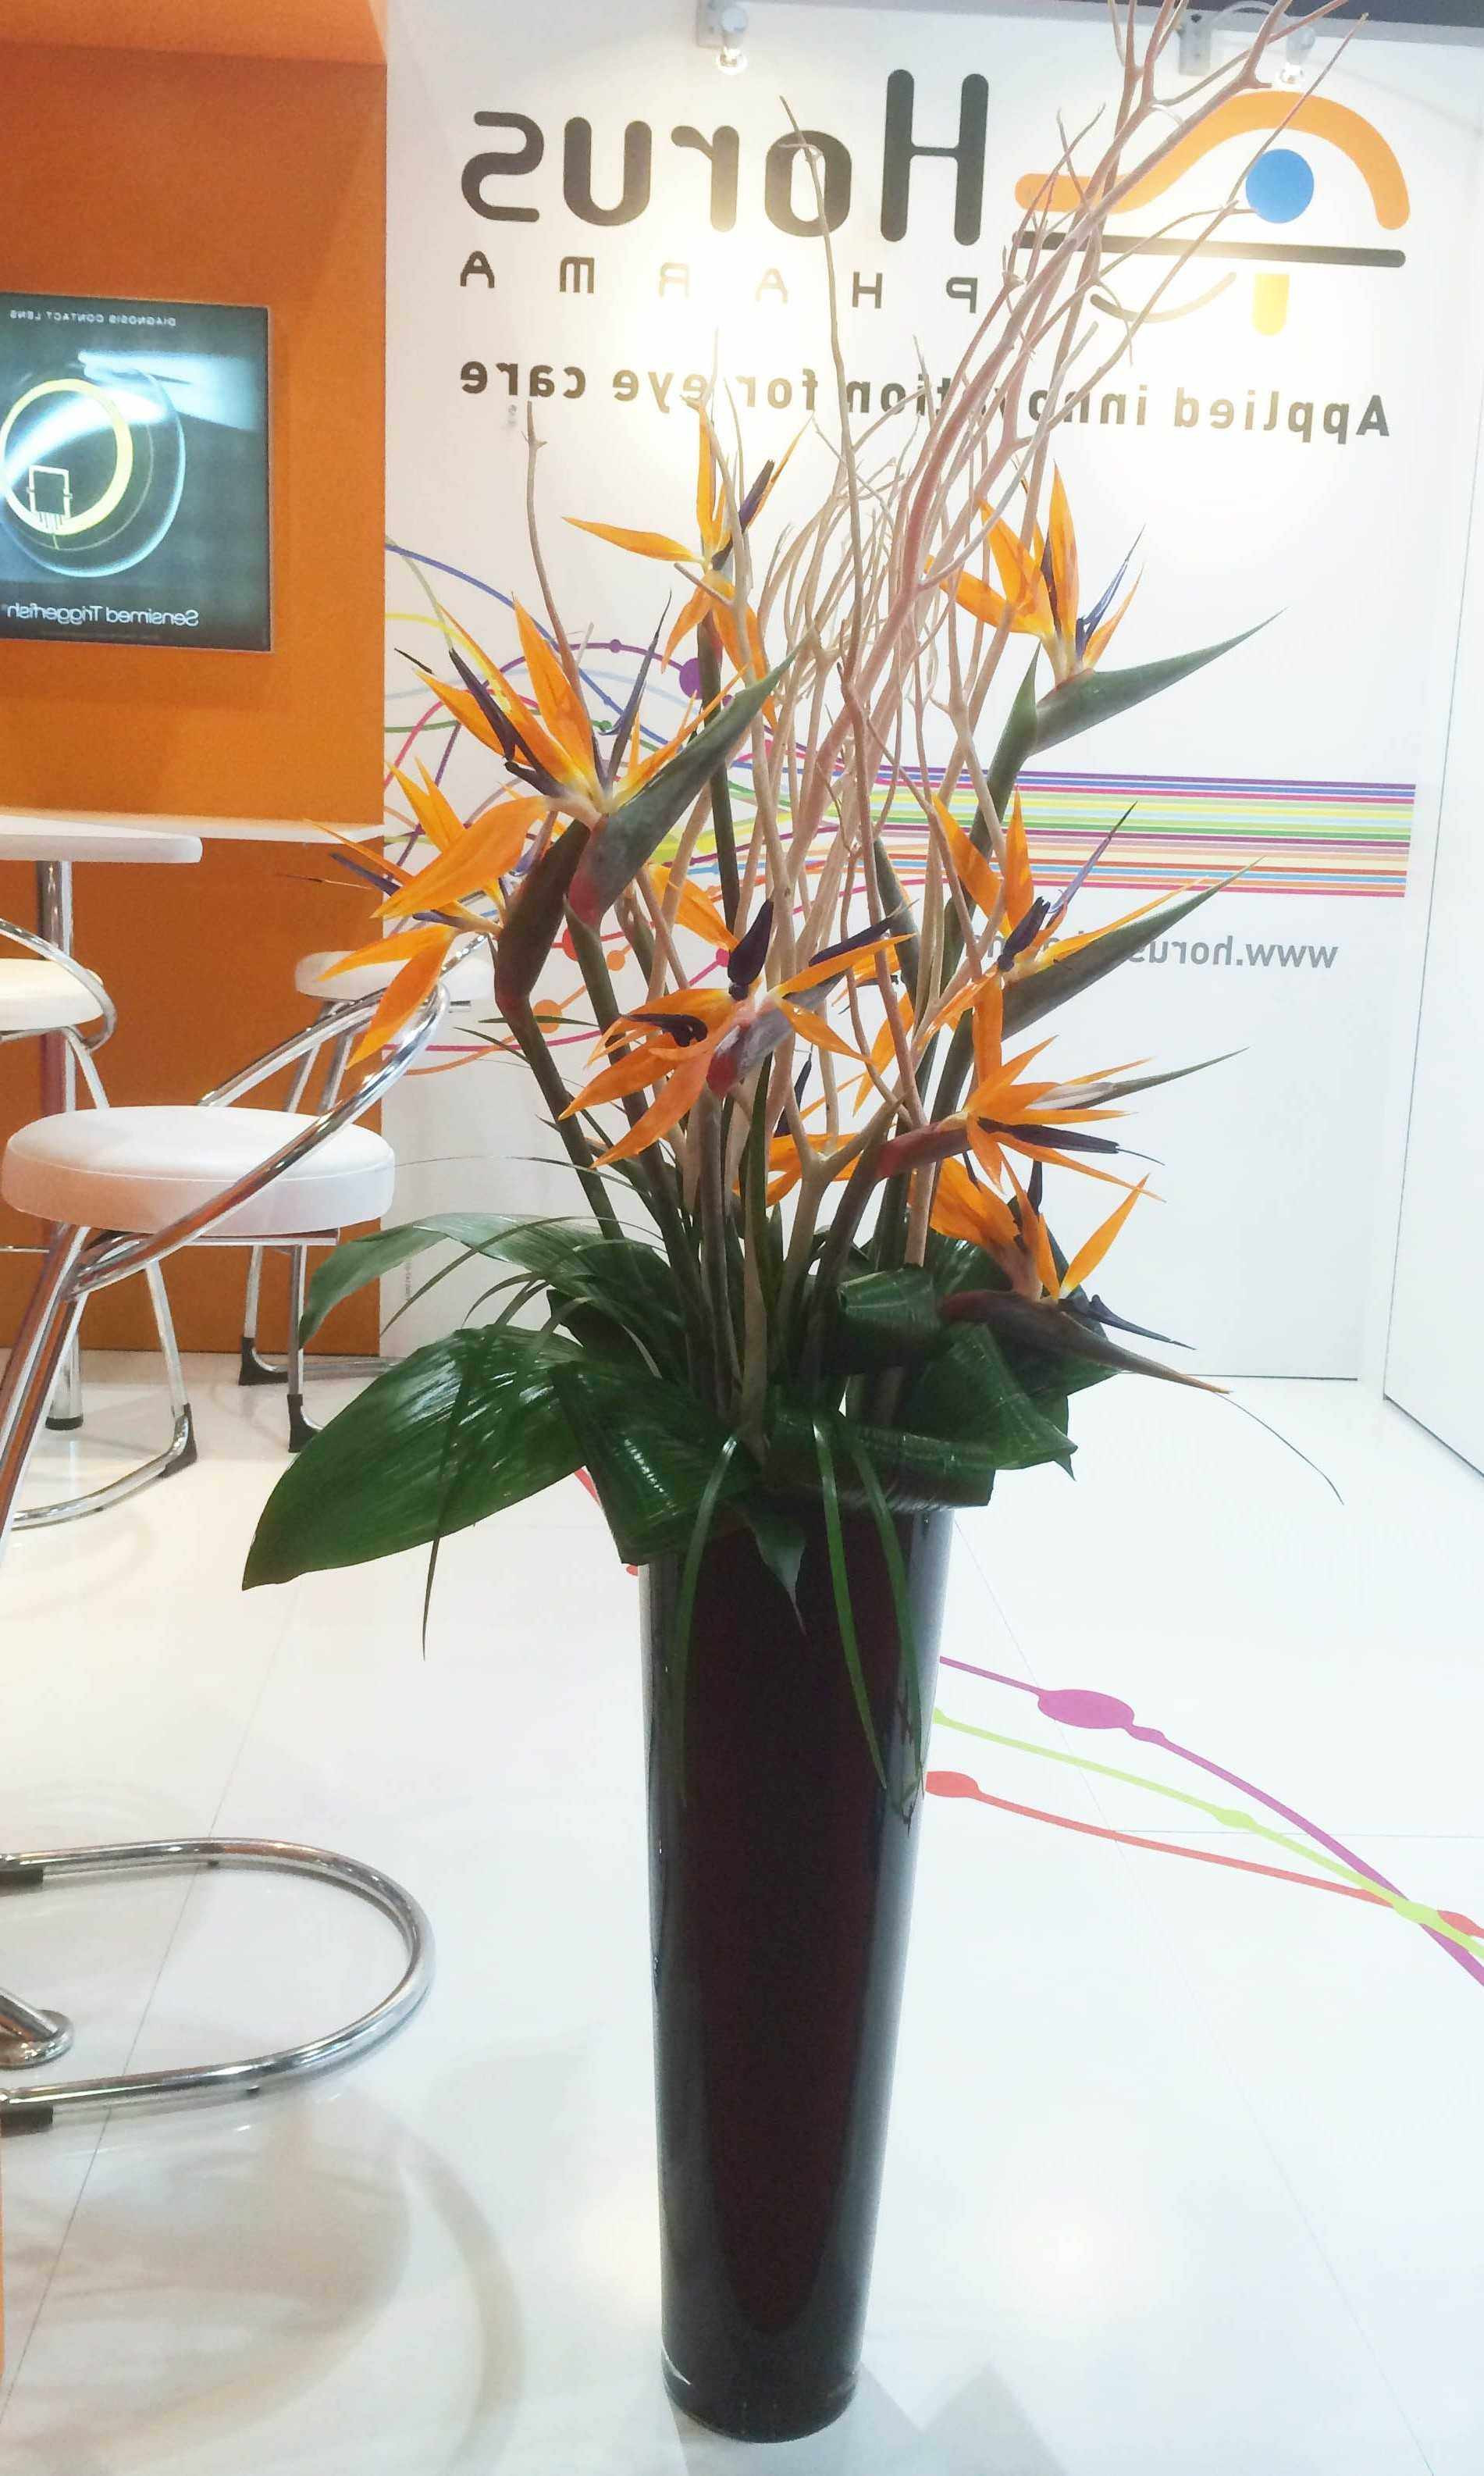 Cheap Flower Delivery Nyc Fresh 2 Od orange Bird Paradise Twig Foliage In Black Vase